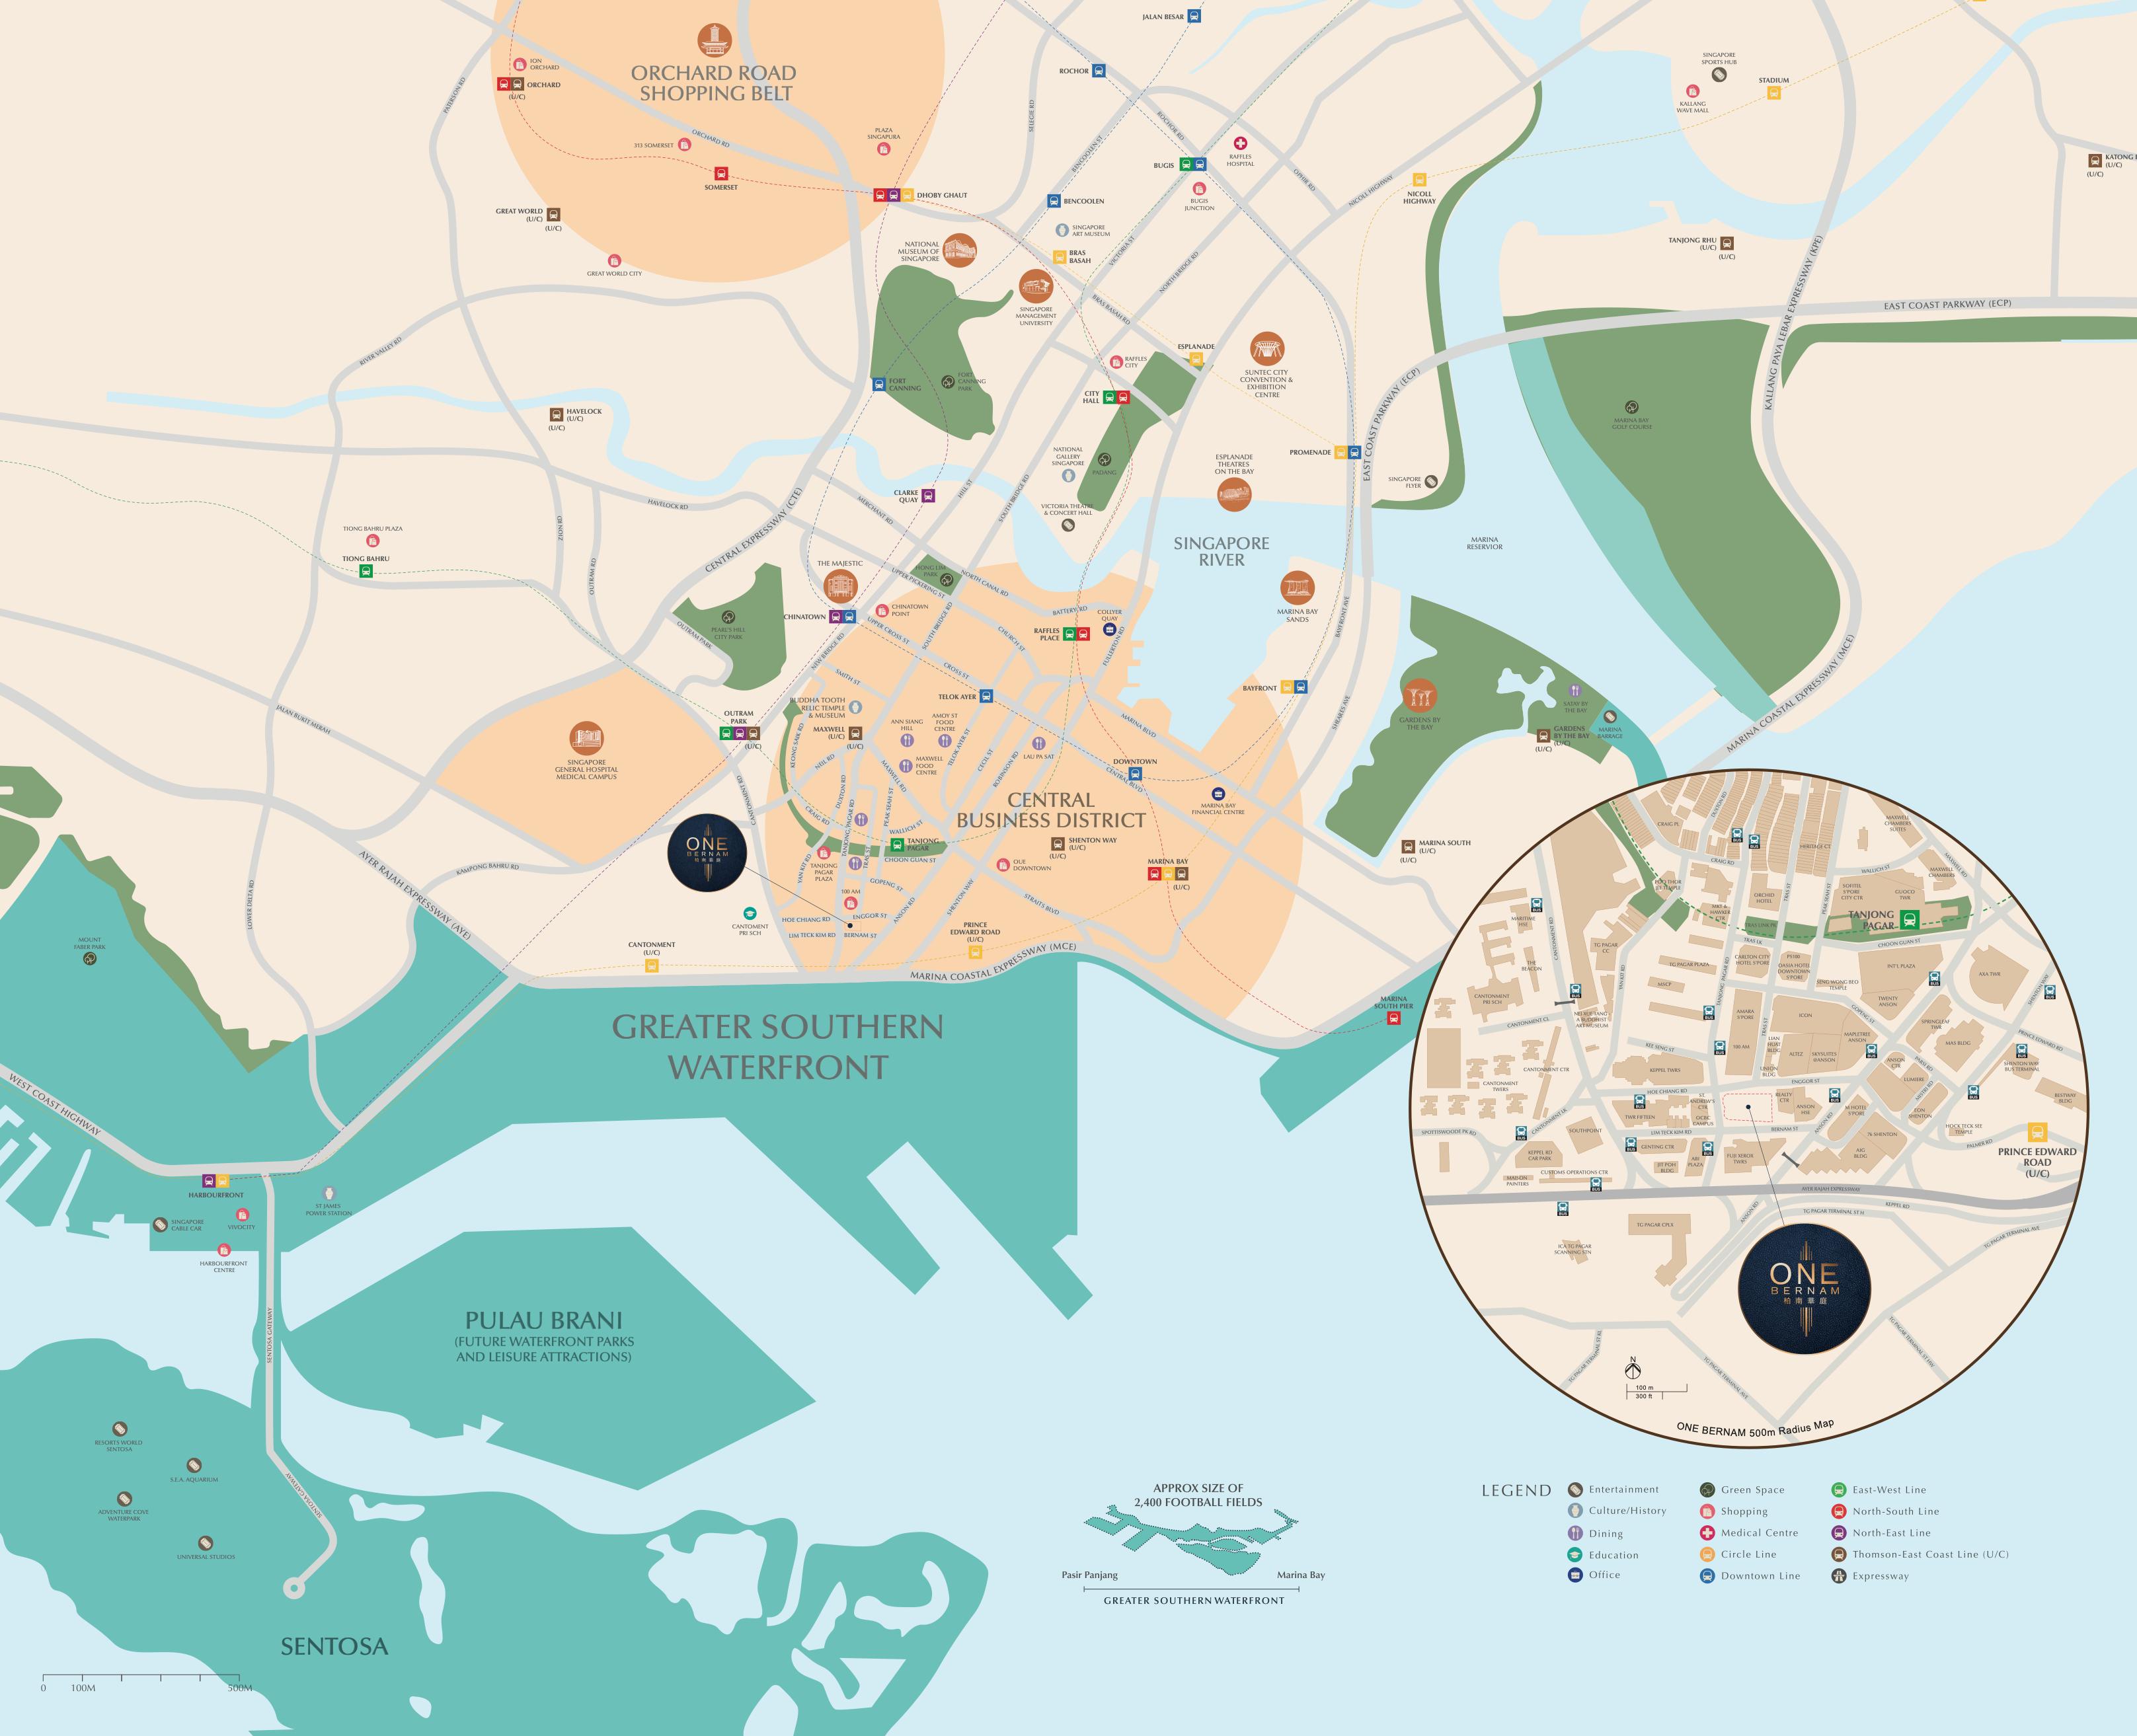 one-bernam-singapore-location-map